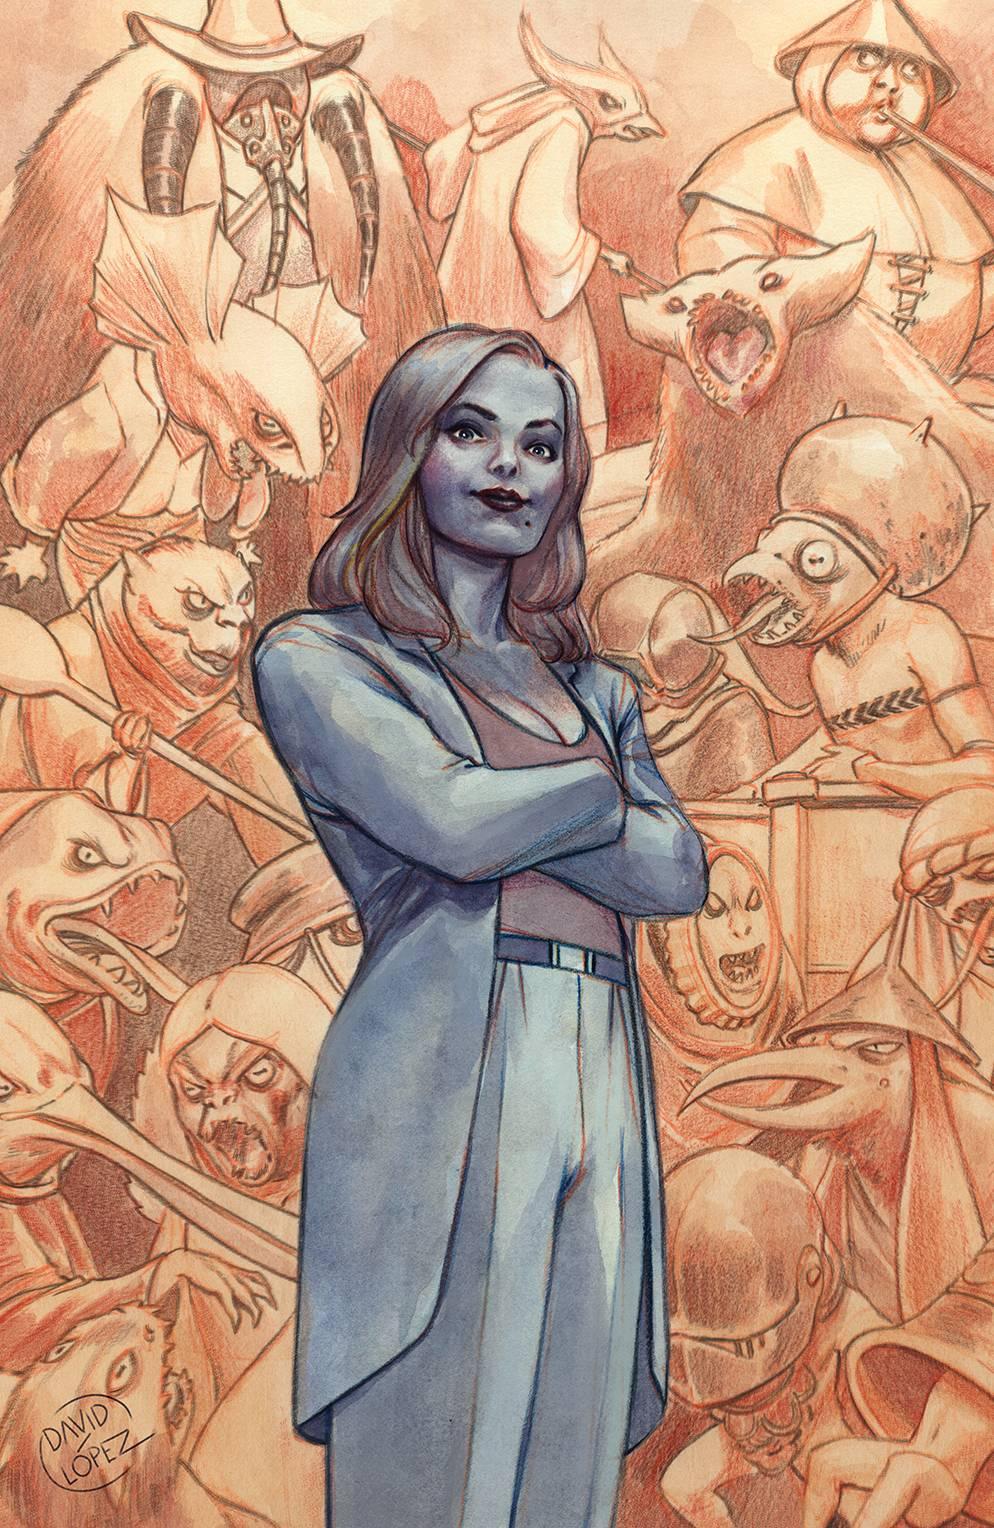 BUFFY THE VAMPIRE SLAYER #21—Cover A: David Lopez